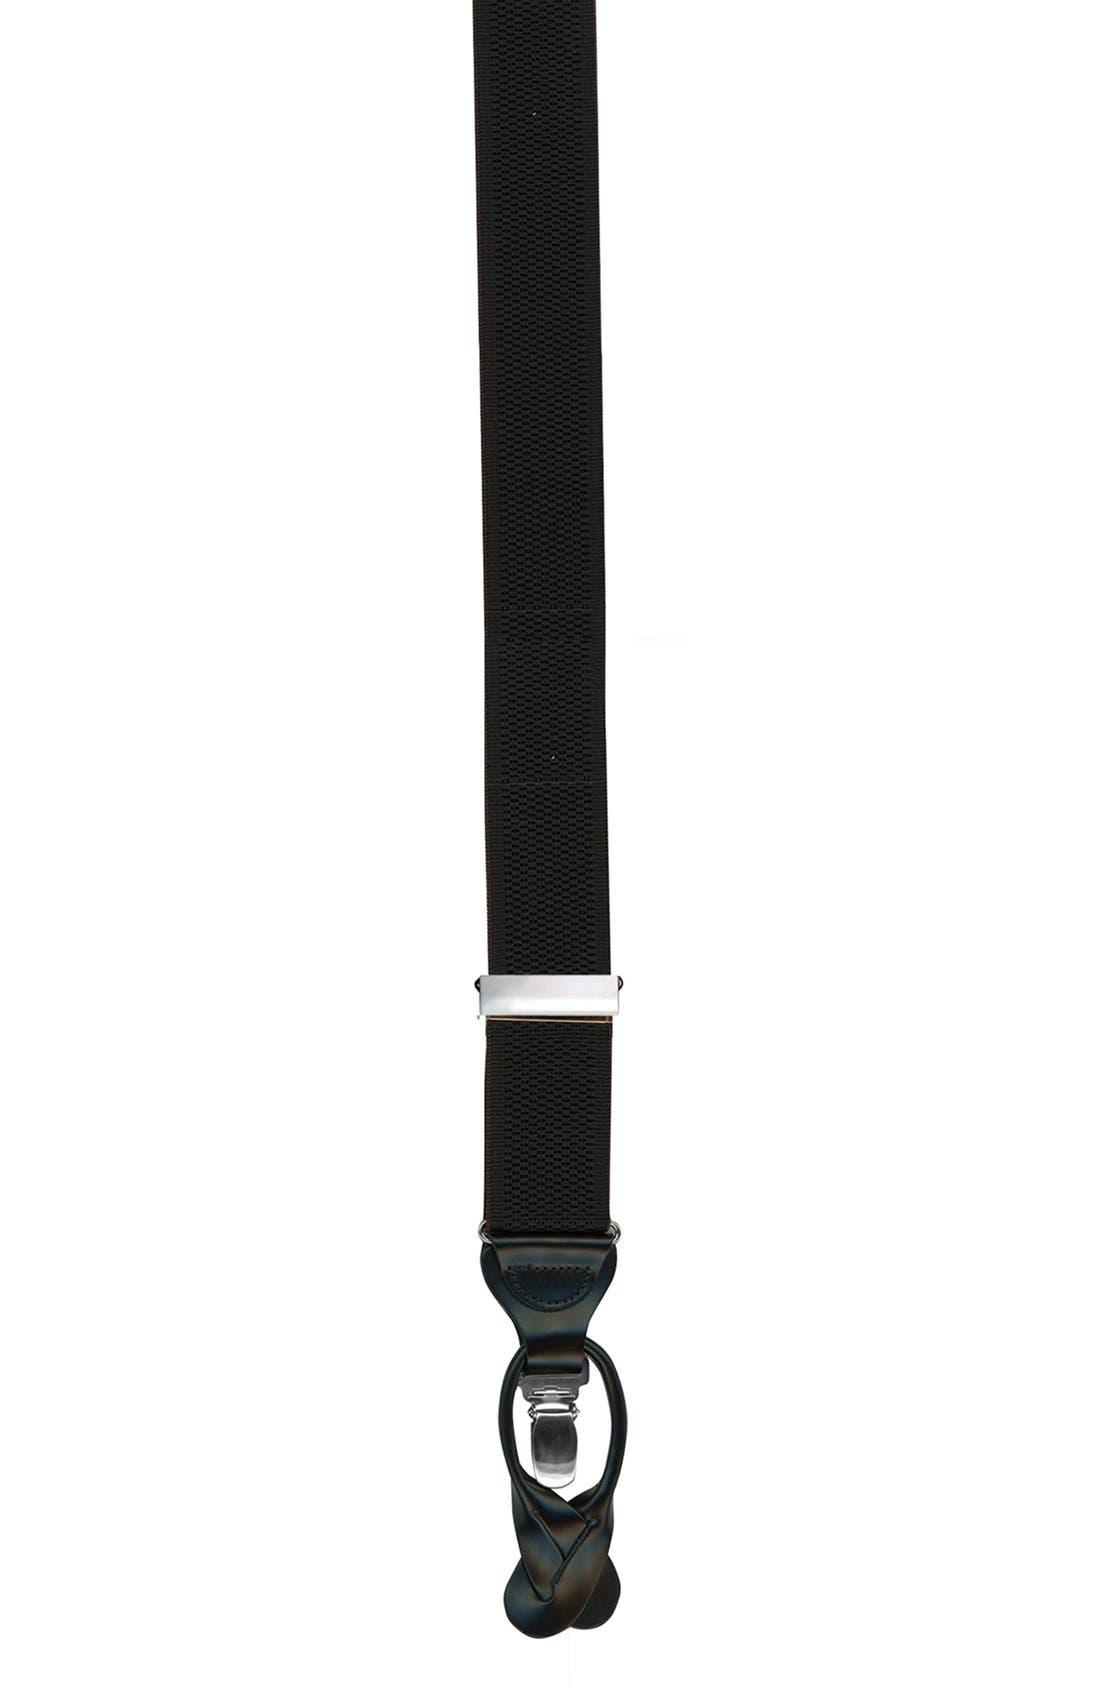 Trafalgar Convertible Stretch Nylon Suspenders